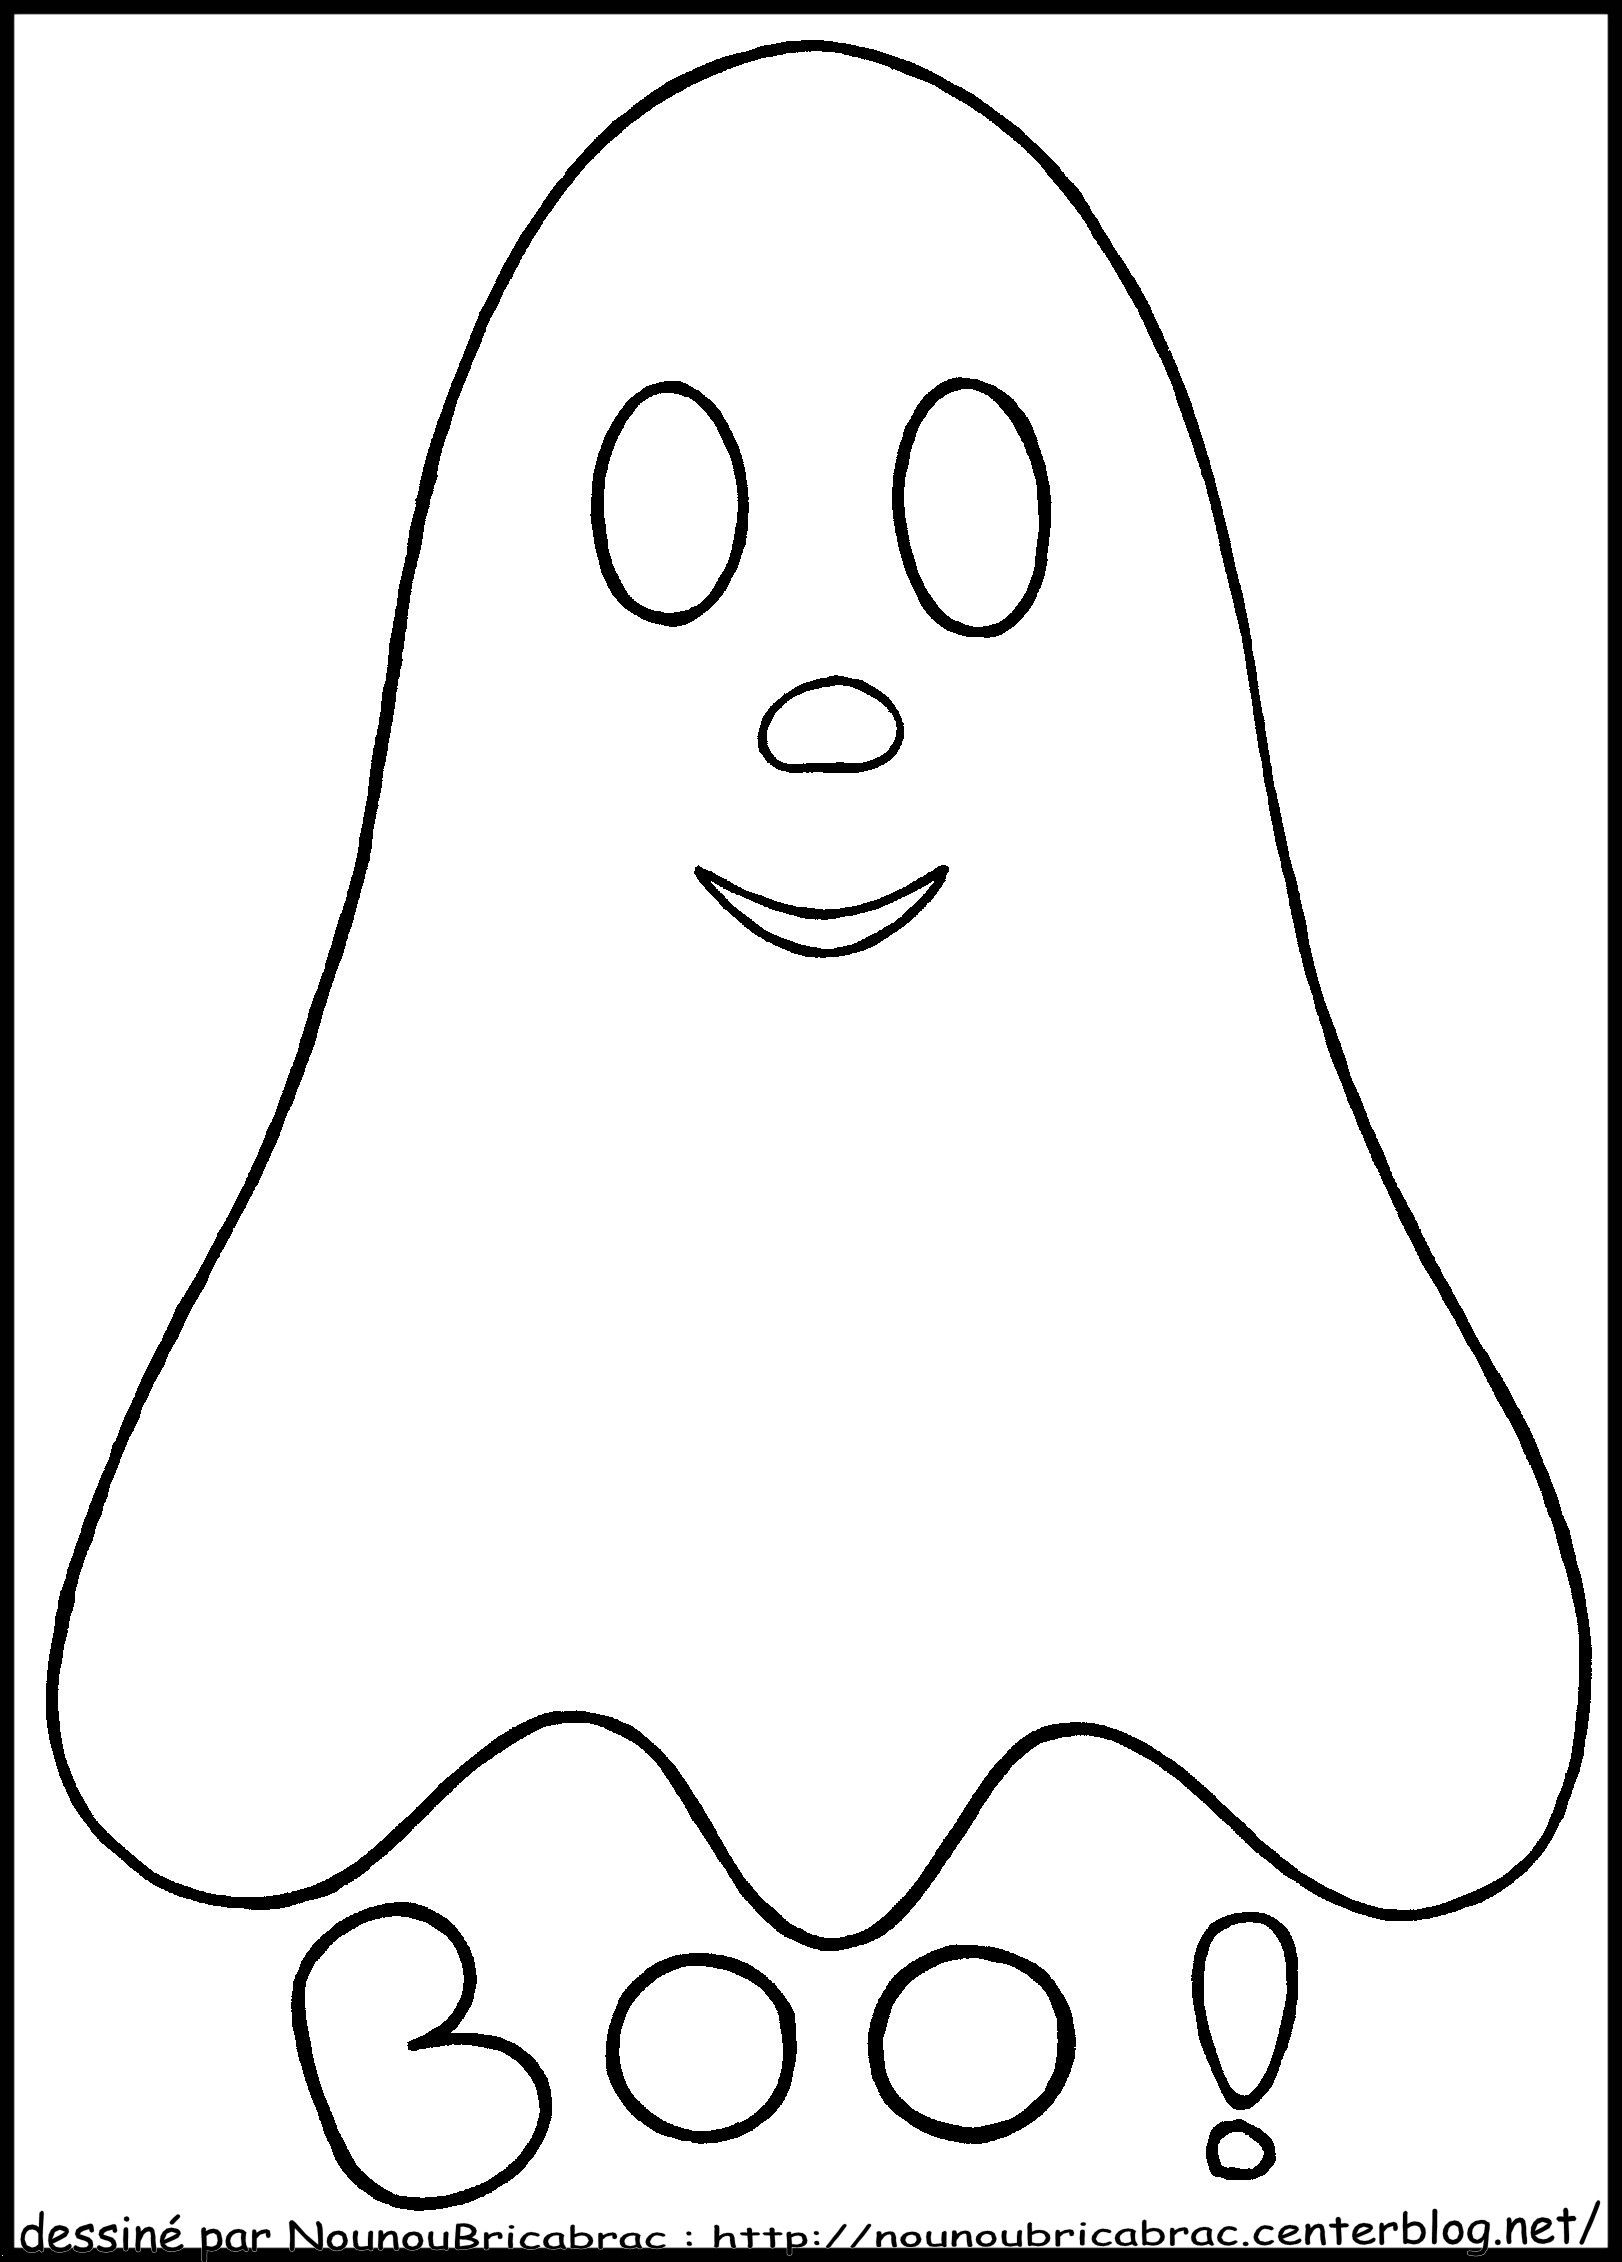 Fantome Dessin Facile - Google Search | Dessin Halloween dedans Coloriage Facile À Imprimer